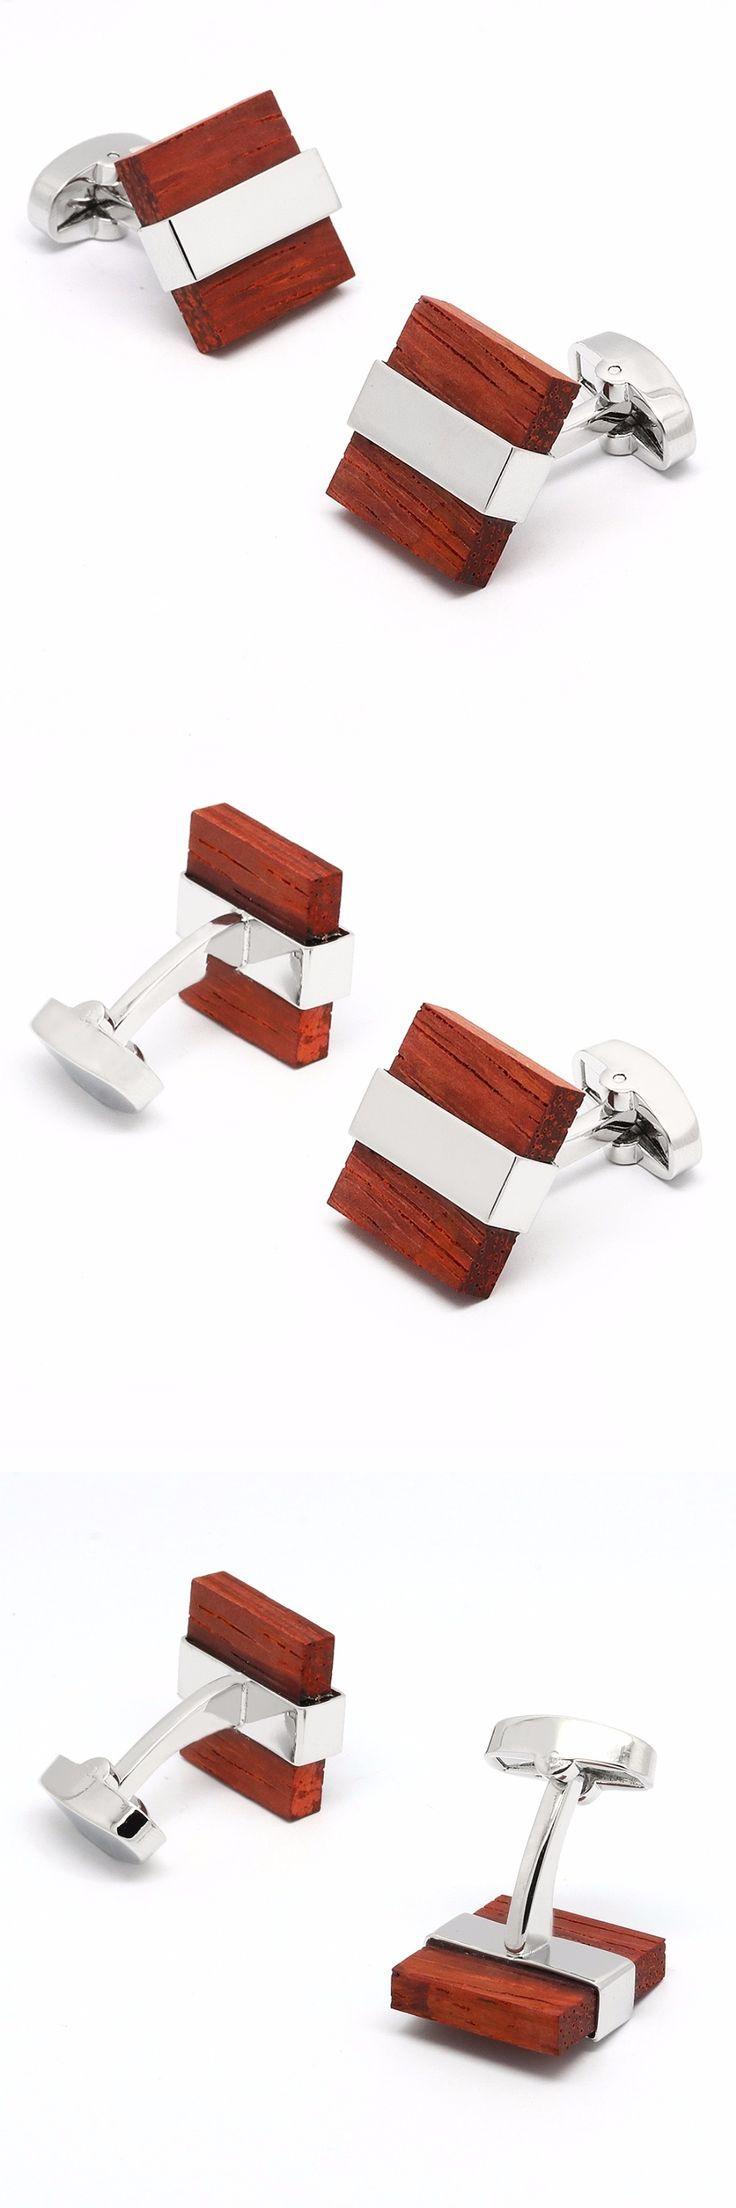 Wood Cufflinks Fashion Copper Cufflink Brand Men Shirt Cuff Links Wedding Groom Gift